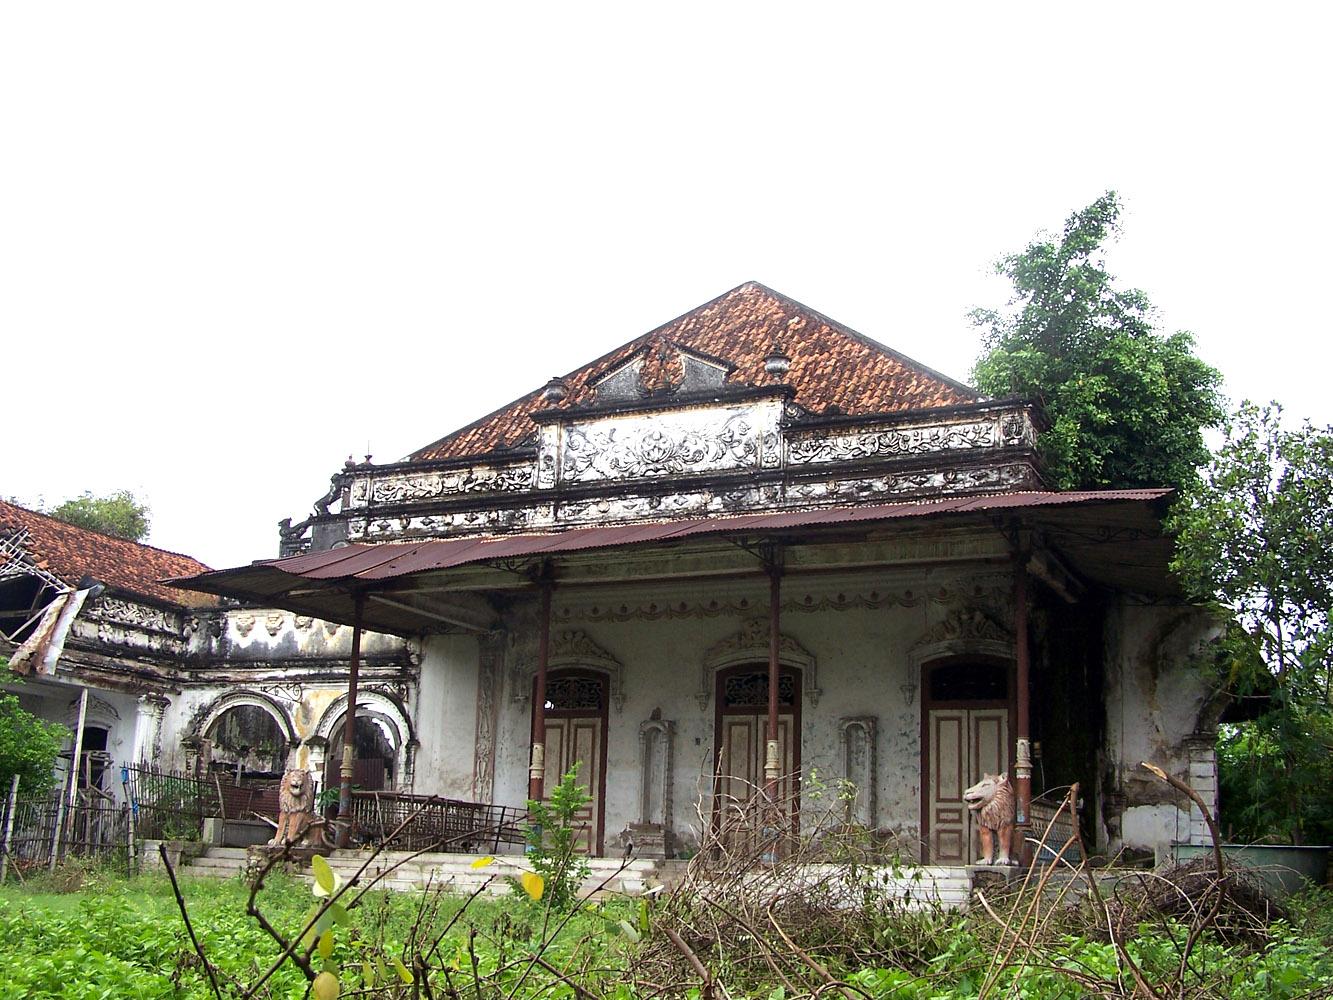 Pertualangan Wisata Kuliner Oktober 2014 Gedung Ctn Makam Dewi Serdadu